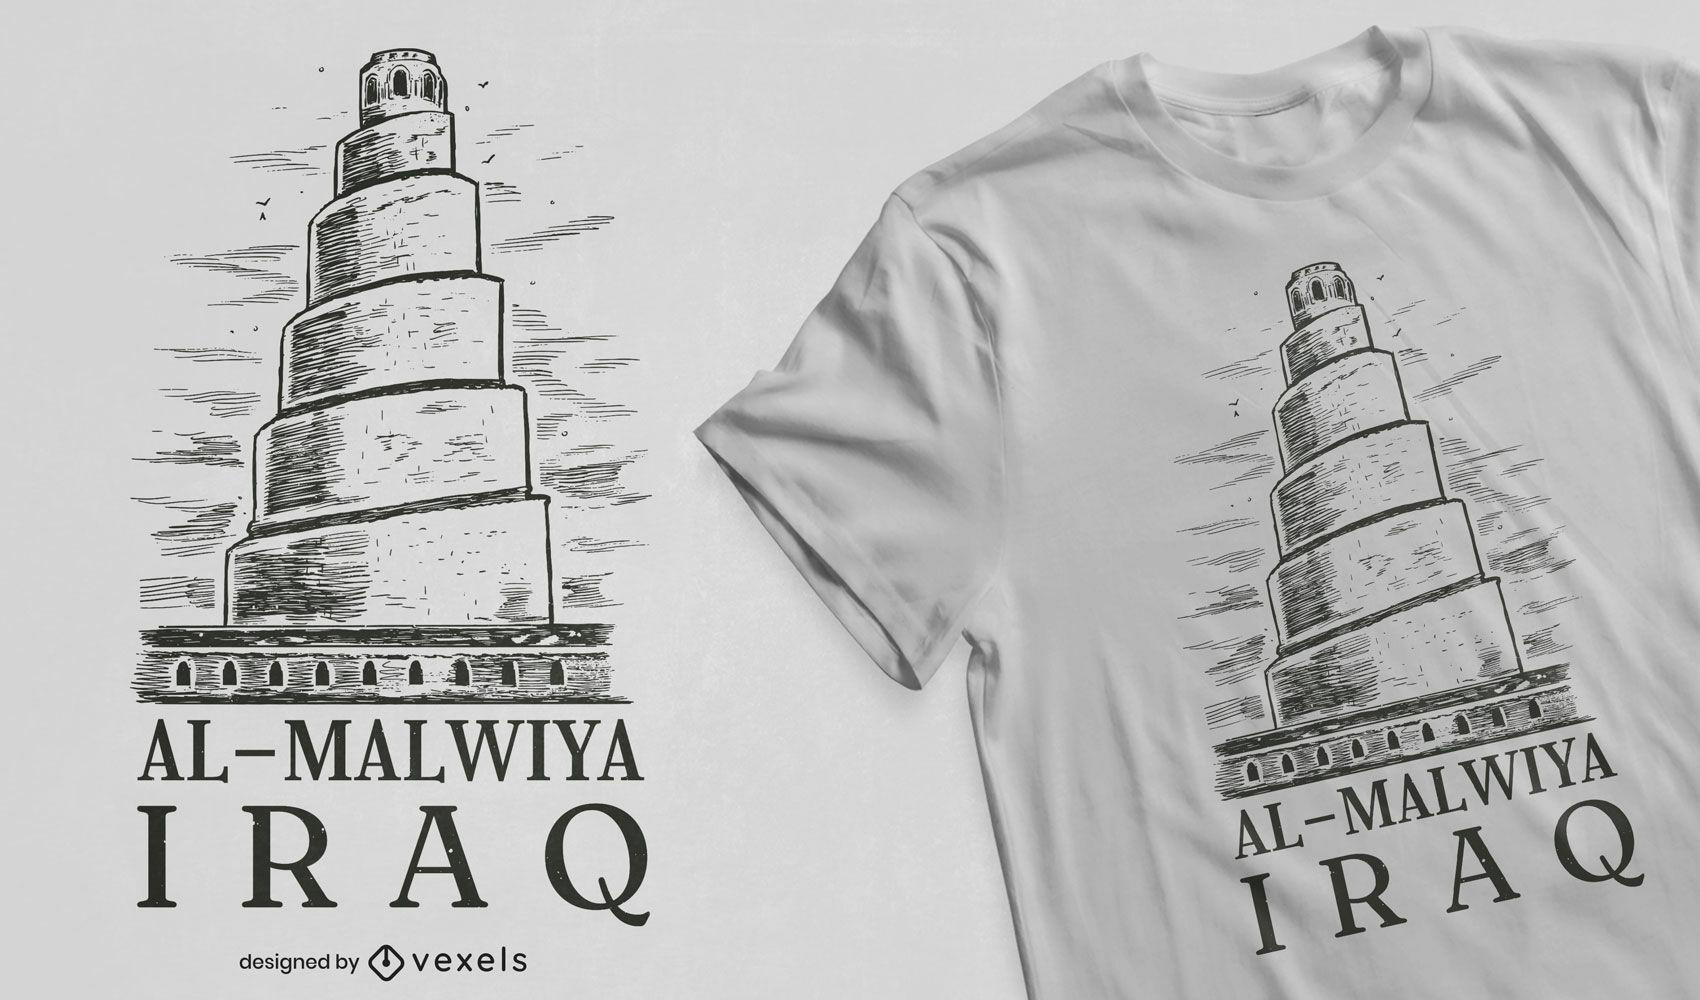 Al-Malwiya Irak Moschee T-Shirt Design